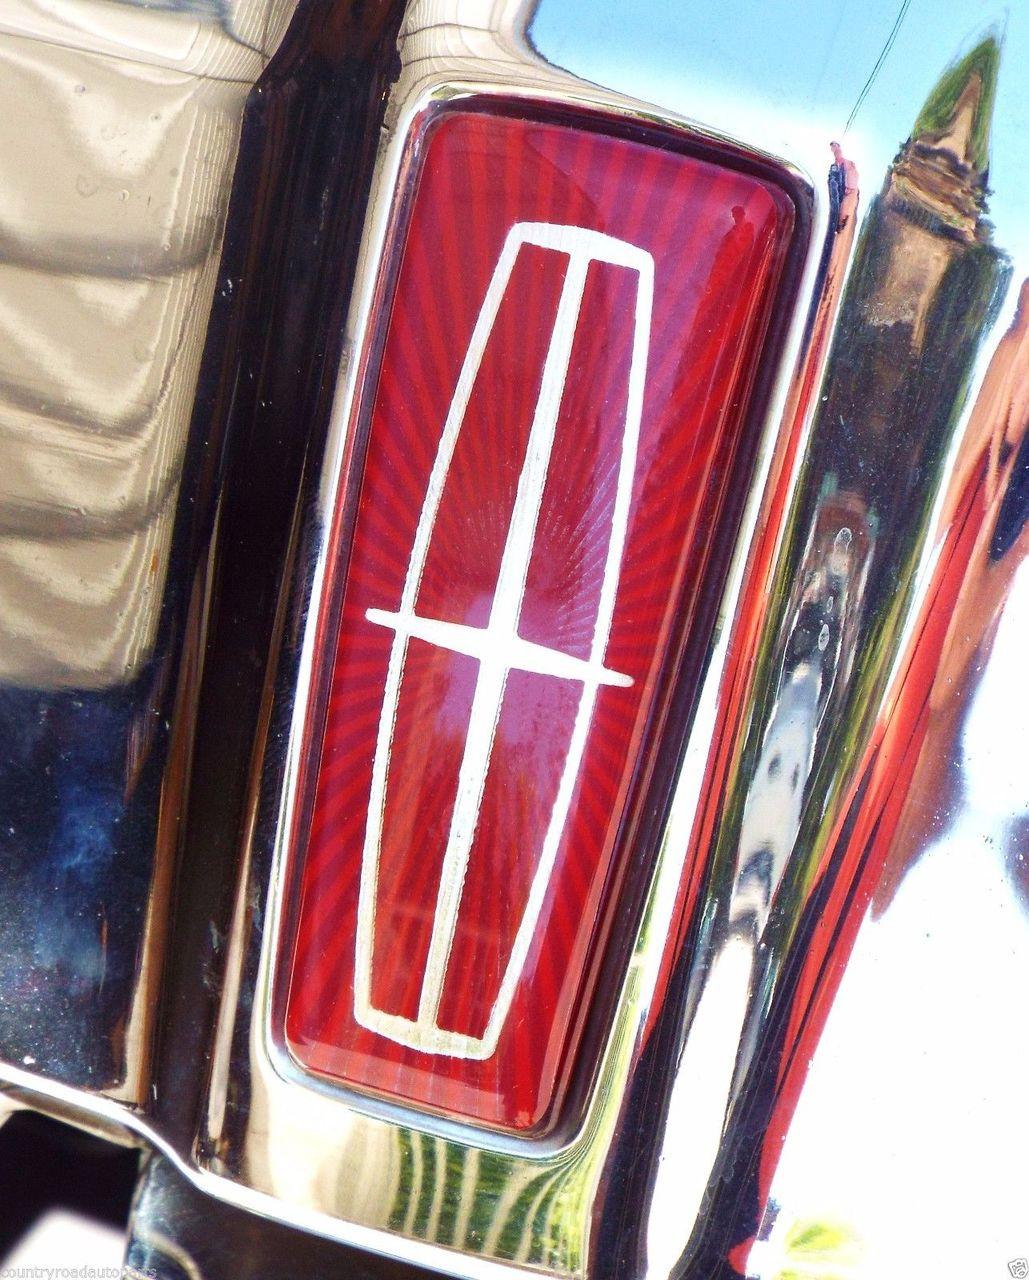 new 1998 1999 2000 2001 2002 lincoln town car hood emblem  [ 1029 x 1280 Pixel ]